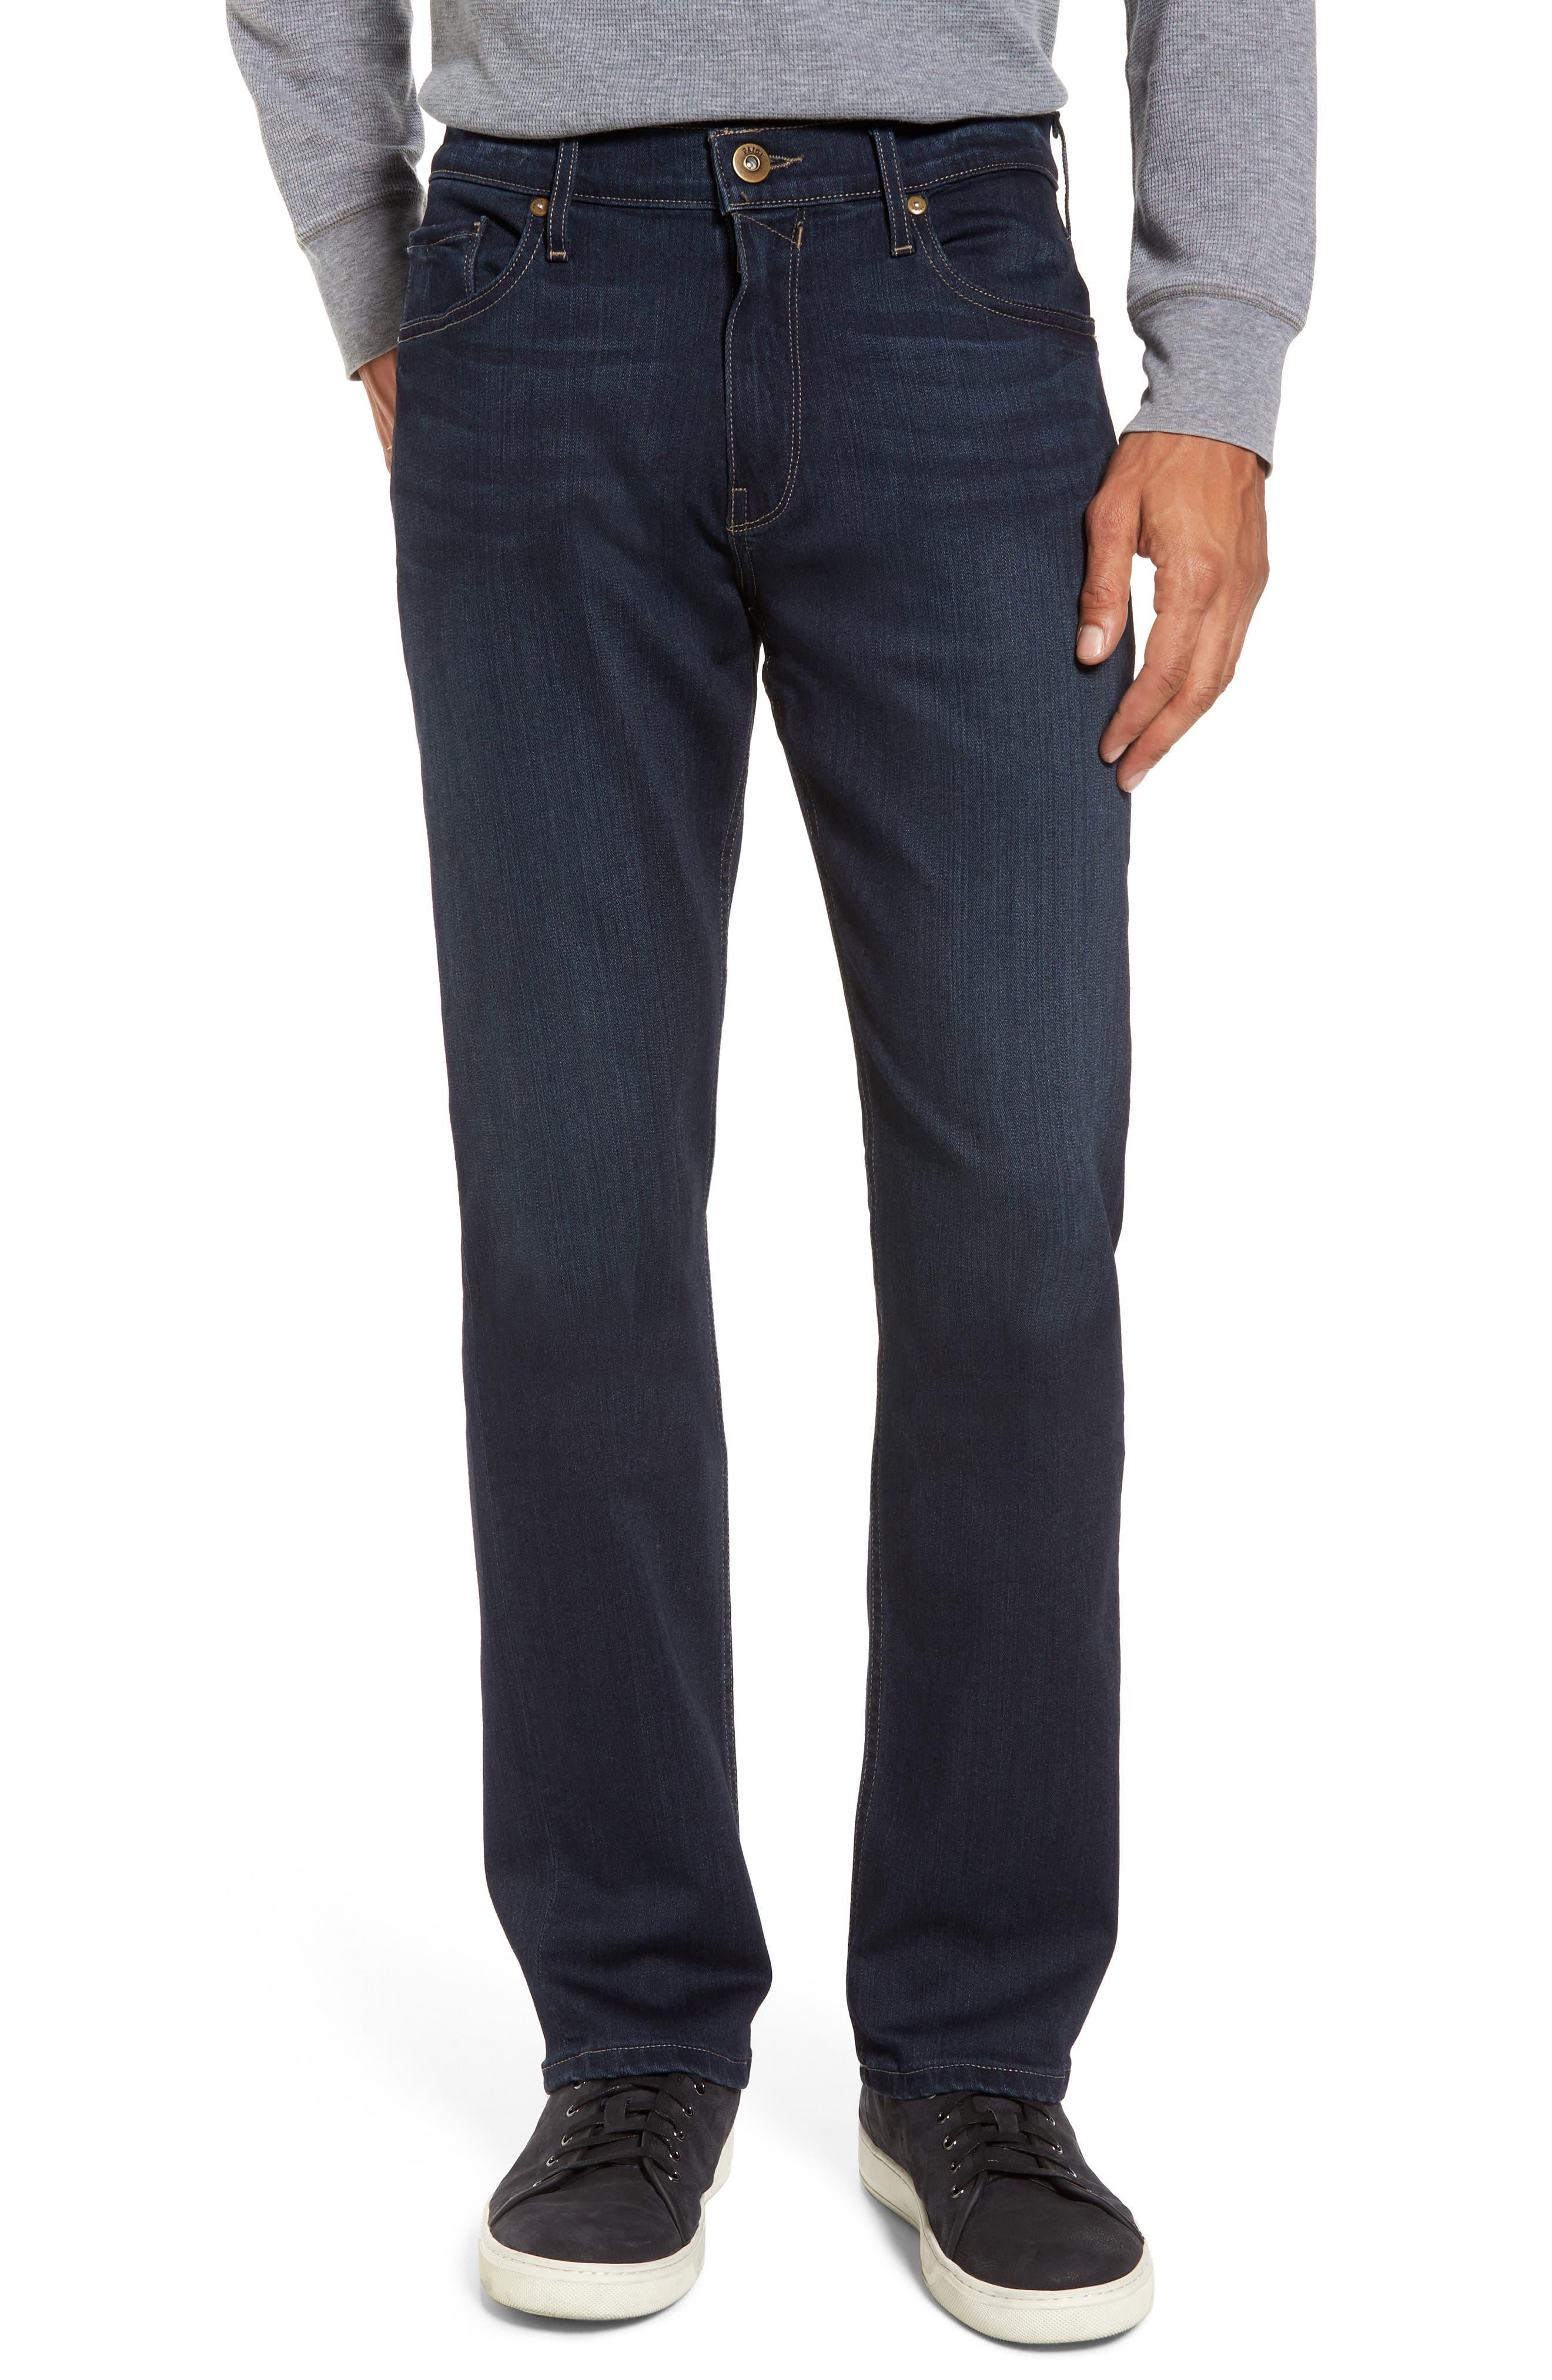 Transcend - Normandie Straight Fit Jeans,                         Main,                         color, 400